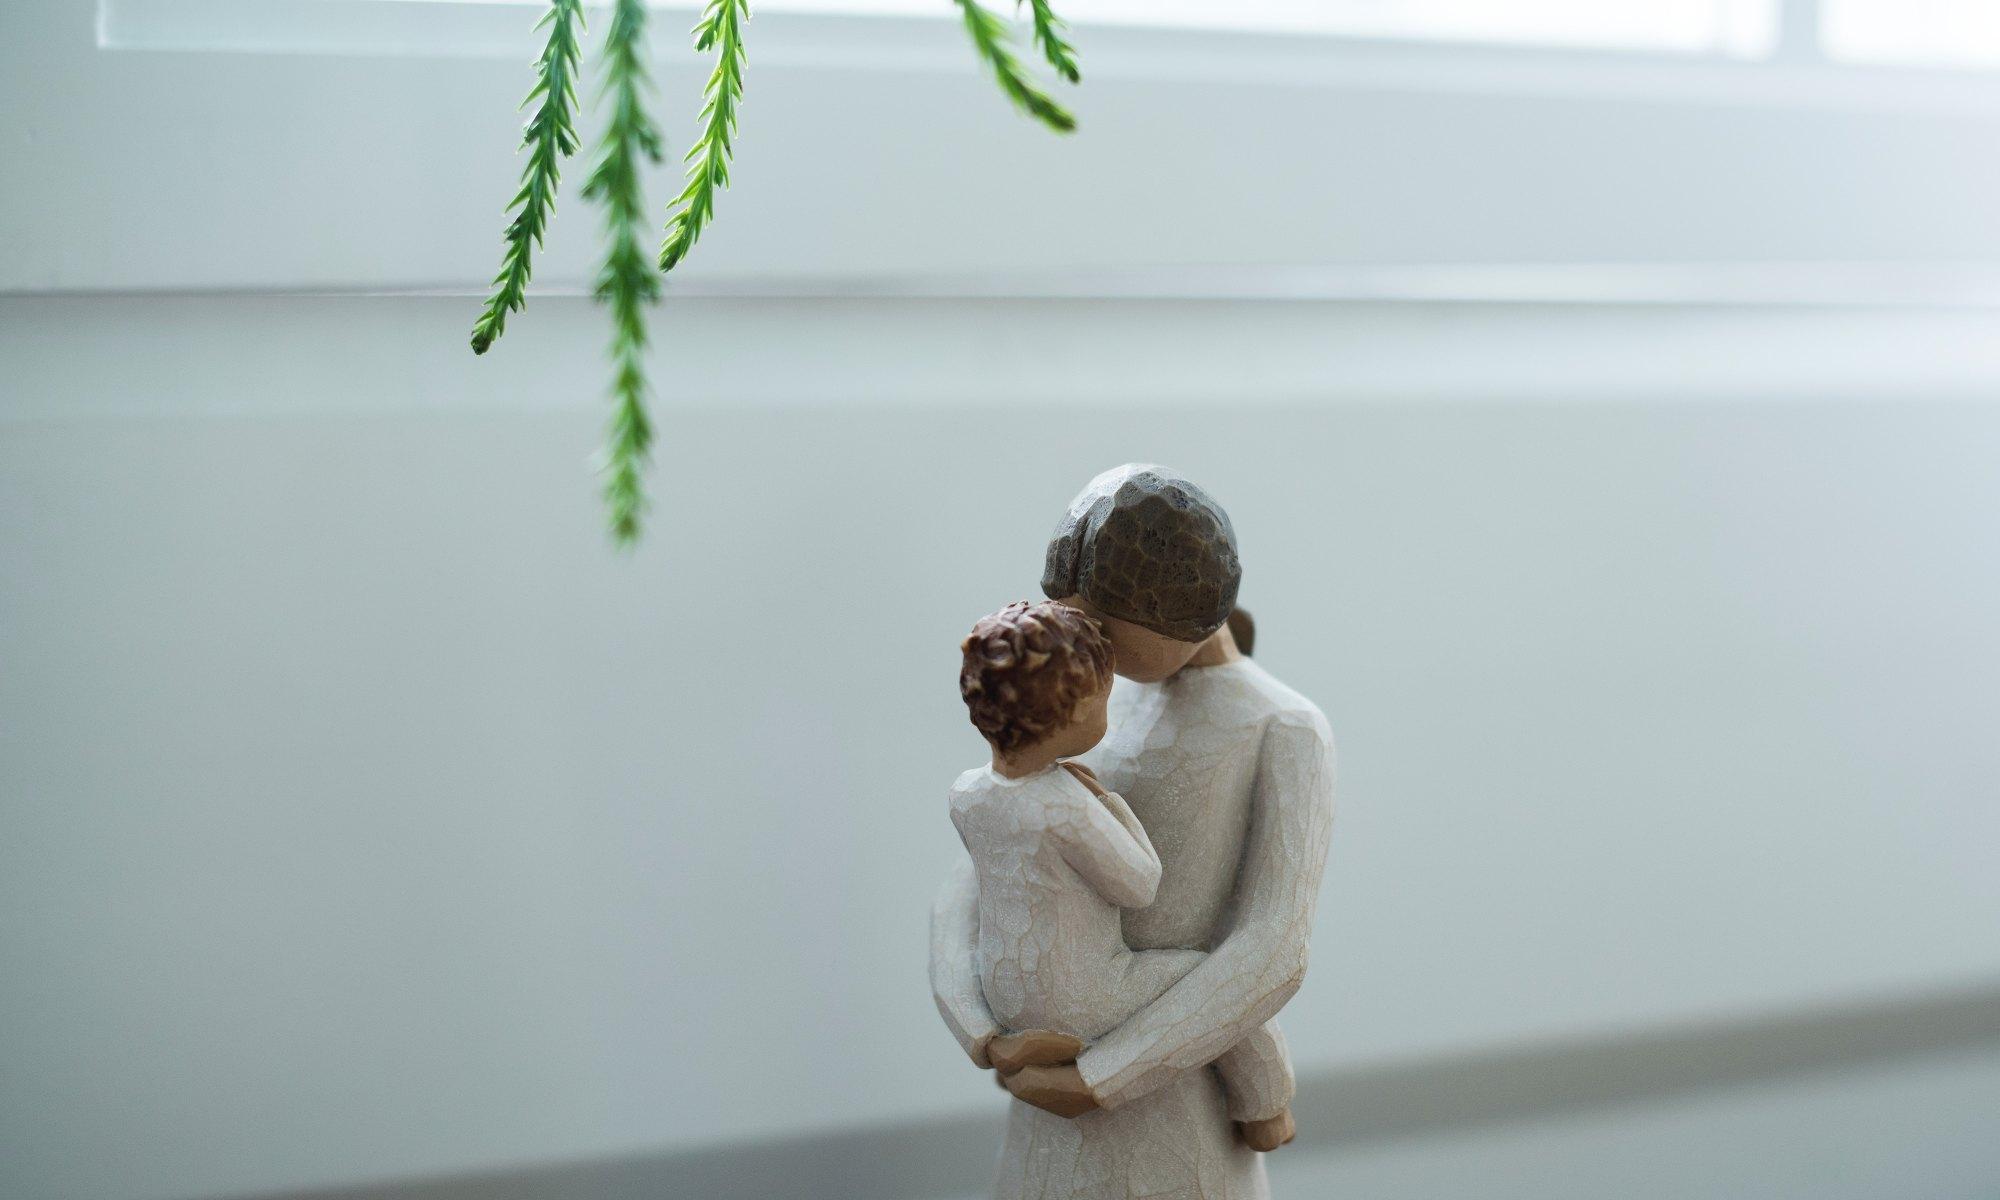 Jacinda Ardern faces big challenges of public opinion on motherhood